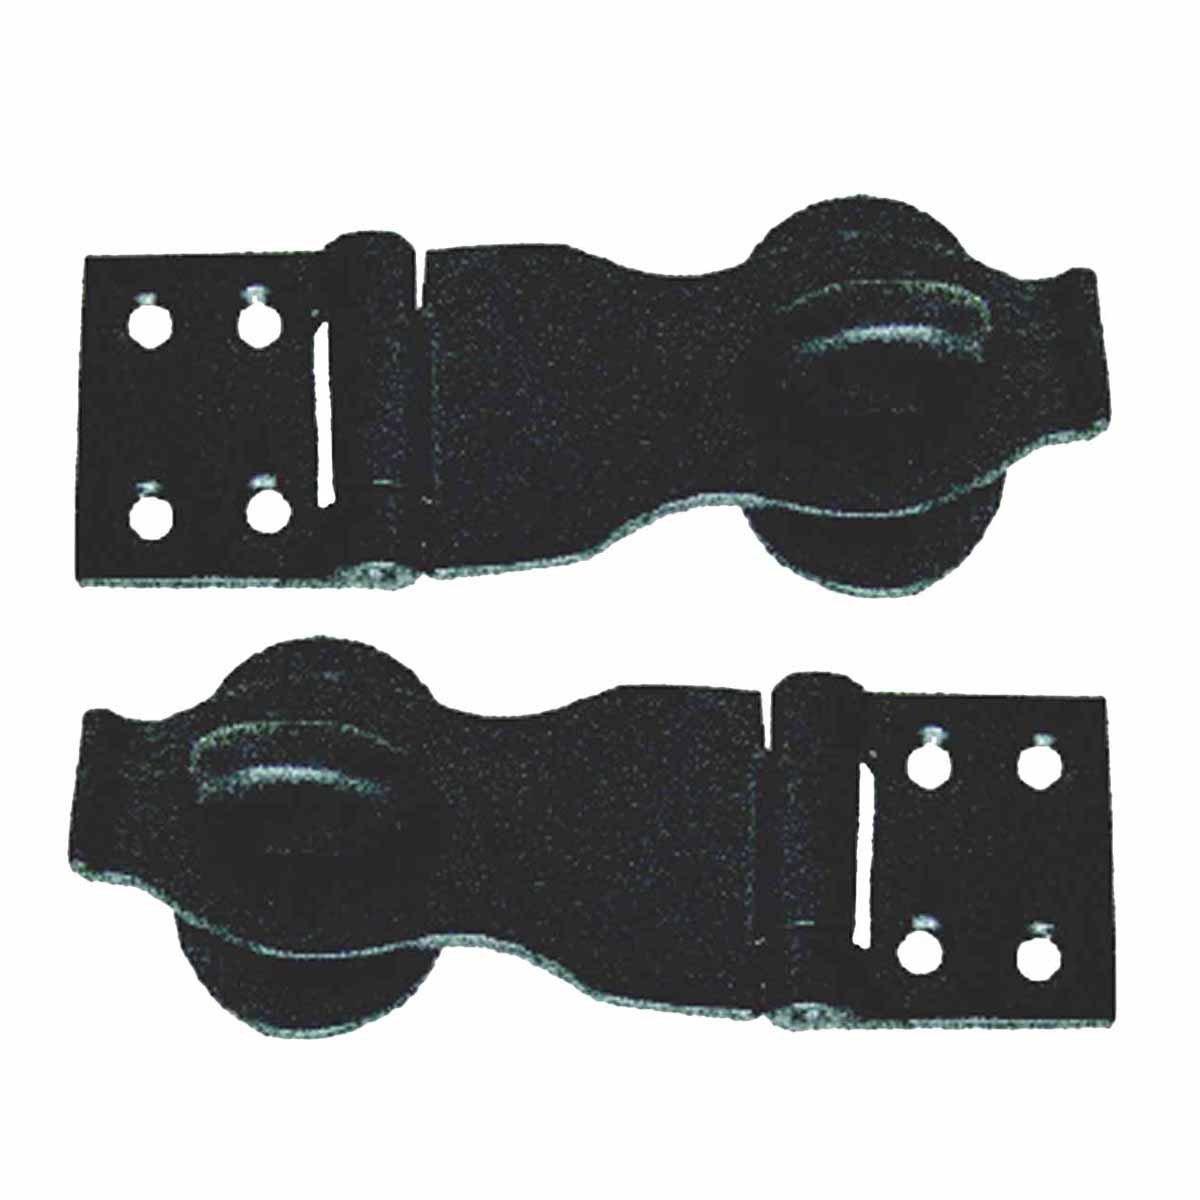 4'' Inch Black Wrought Iron Hasp Renovator's Supply Set of 2